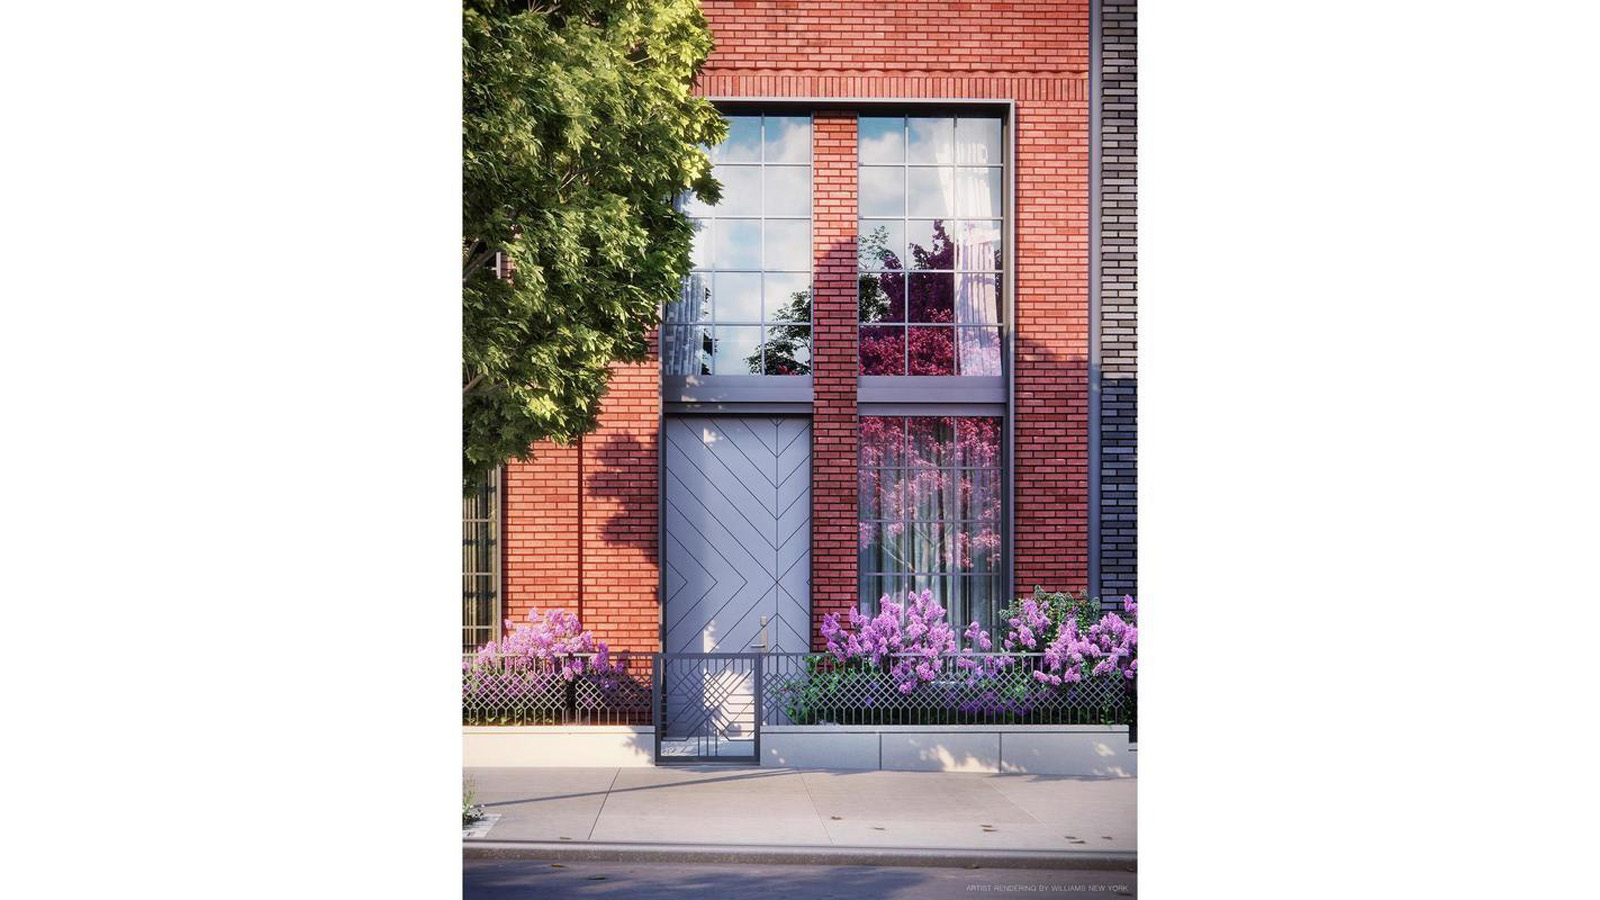 Polhemus Townhouses, 88-98 Amity Street